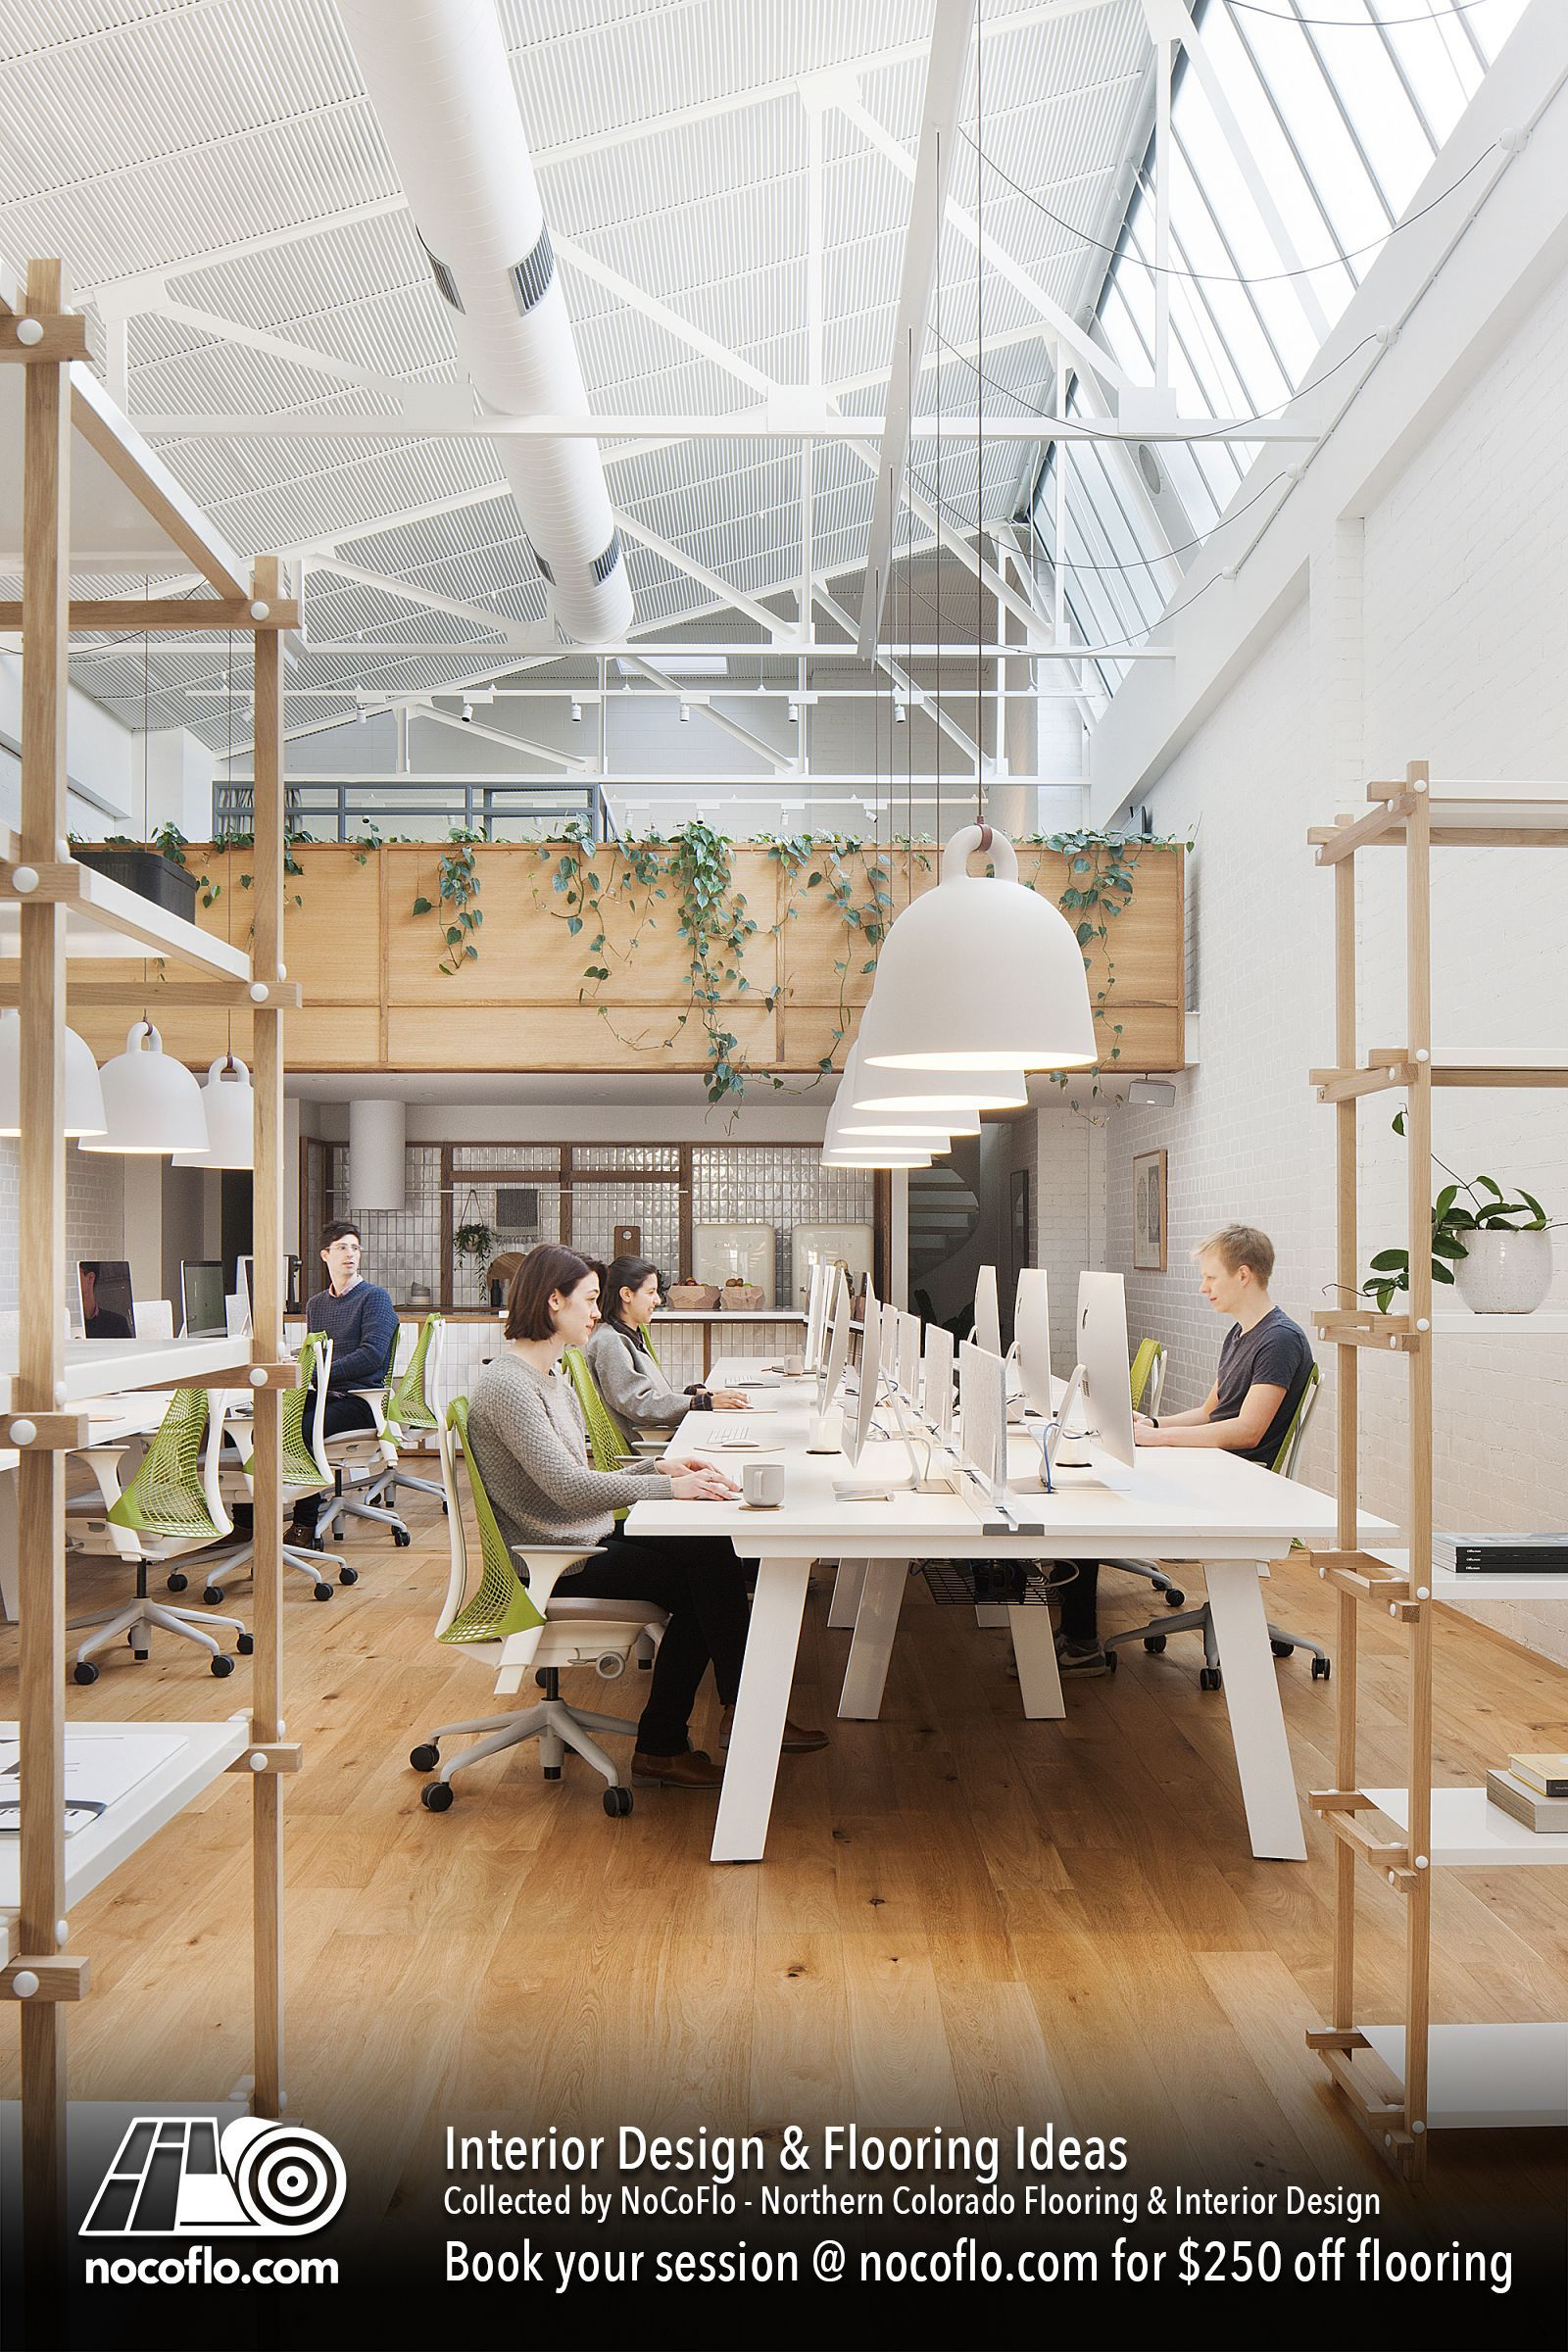 Interior Design Ideas Collected By Http Nocoflo Com Live In Northern Colorado Get 250 Off Fl Modern Office Space Office Space Design Office Interior Design